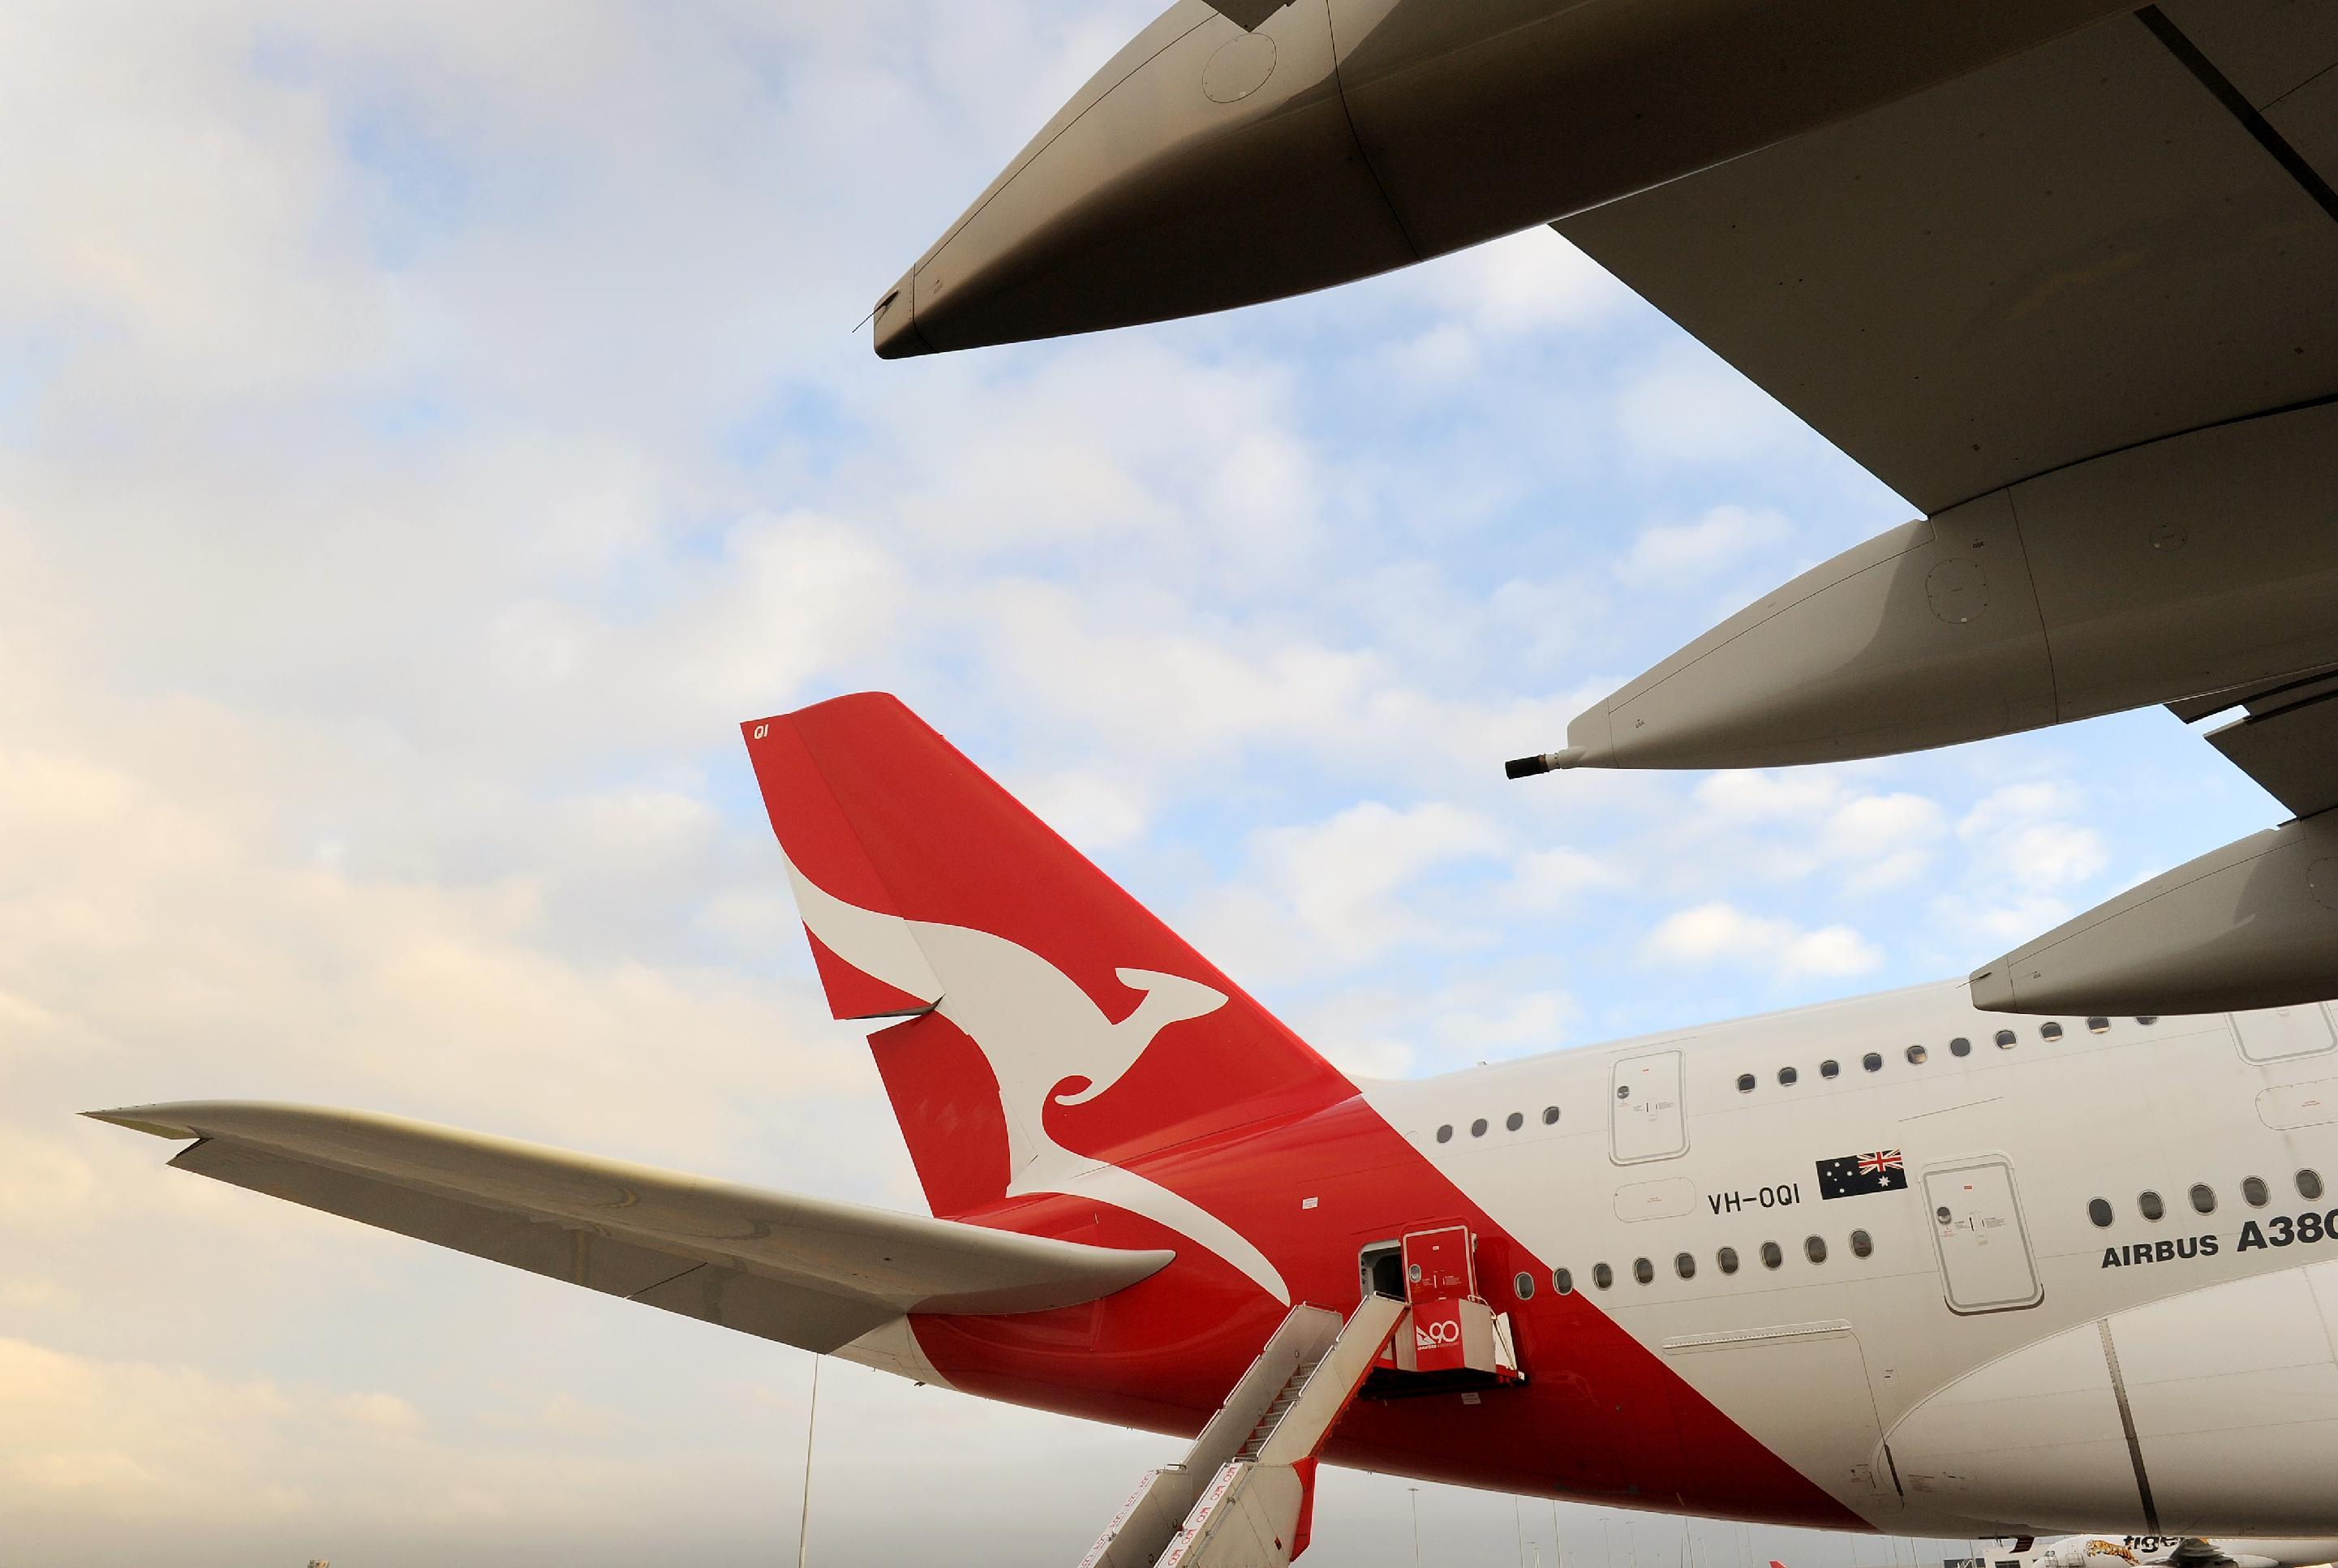 Qantas to test ultra long-haul Sydney to NY, London flights